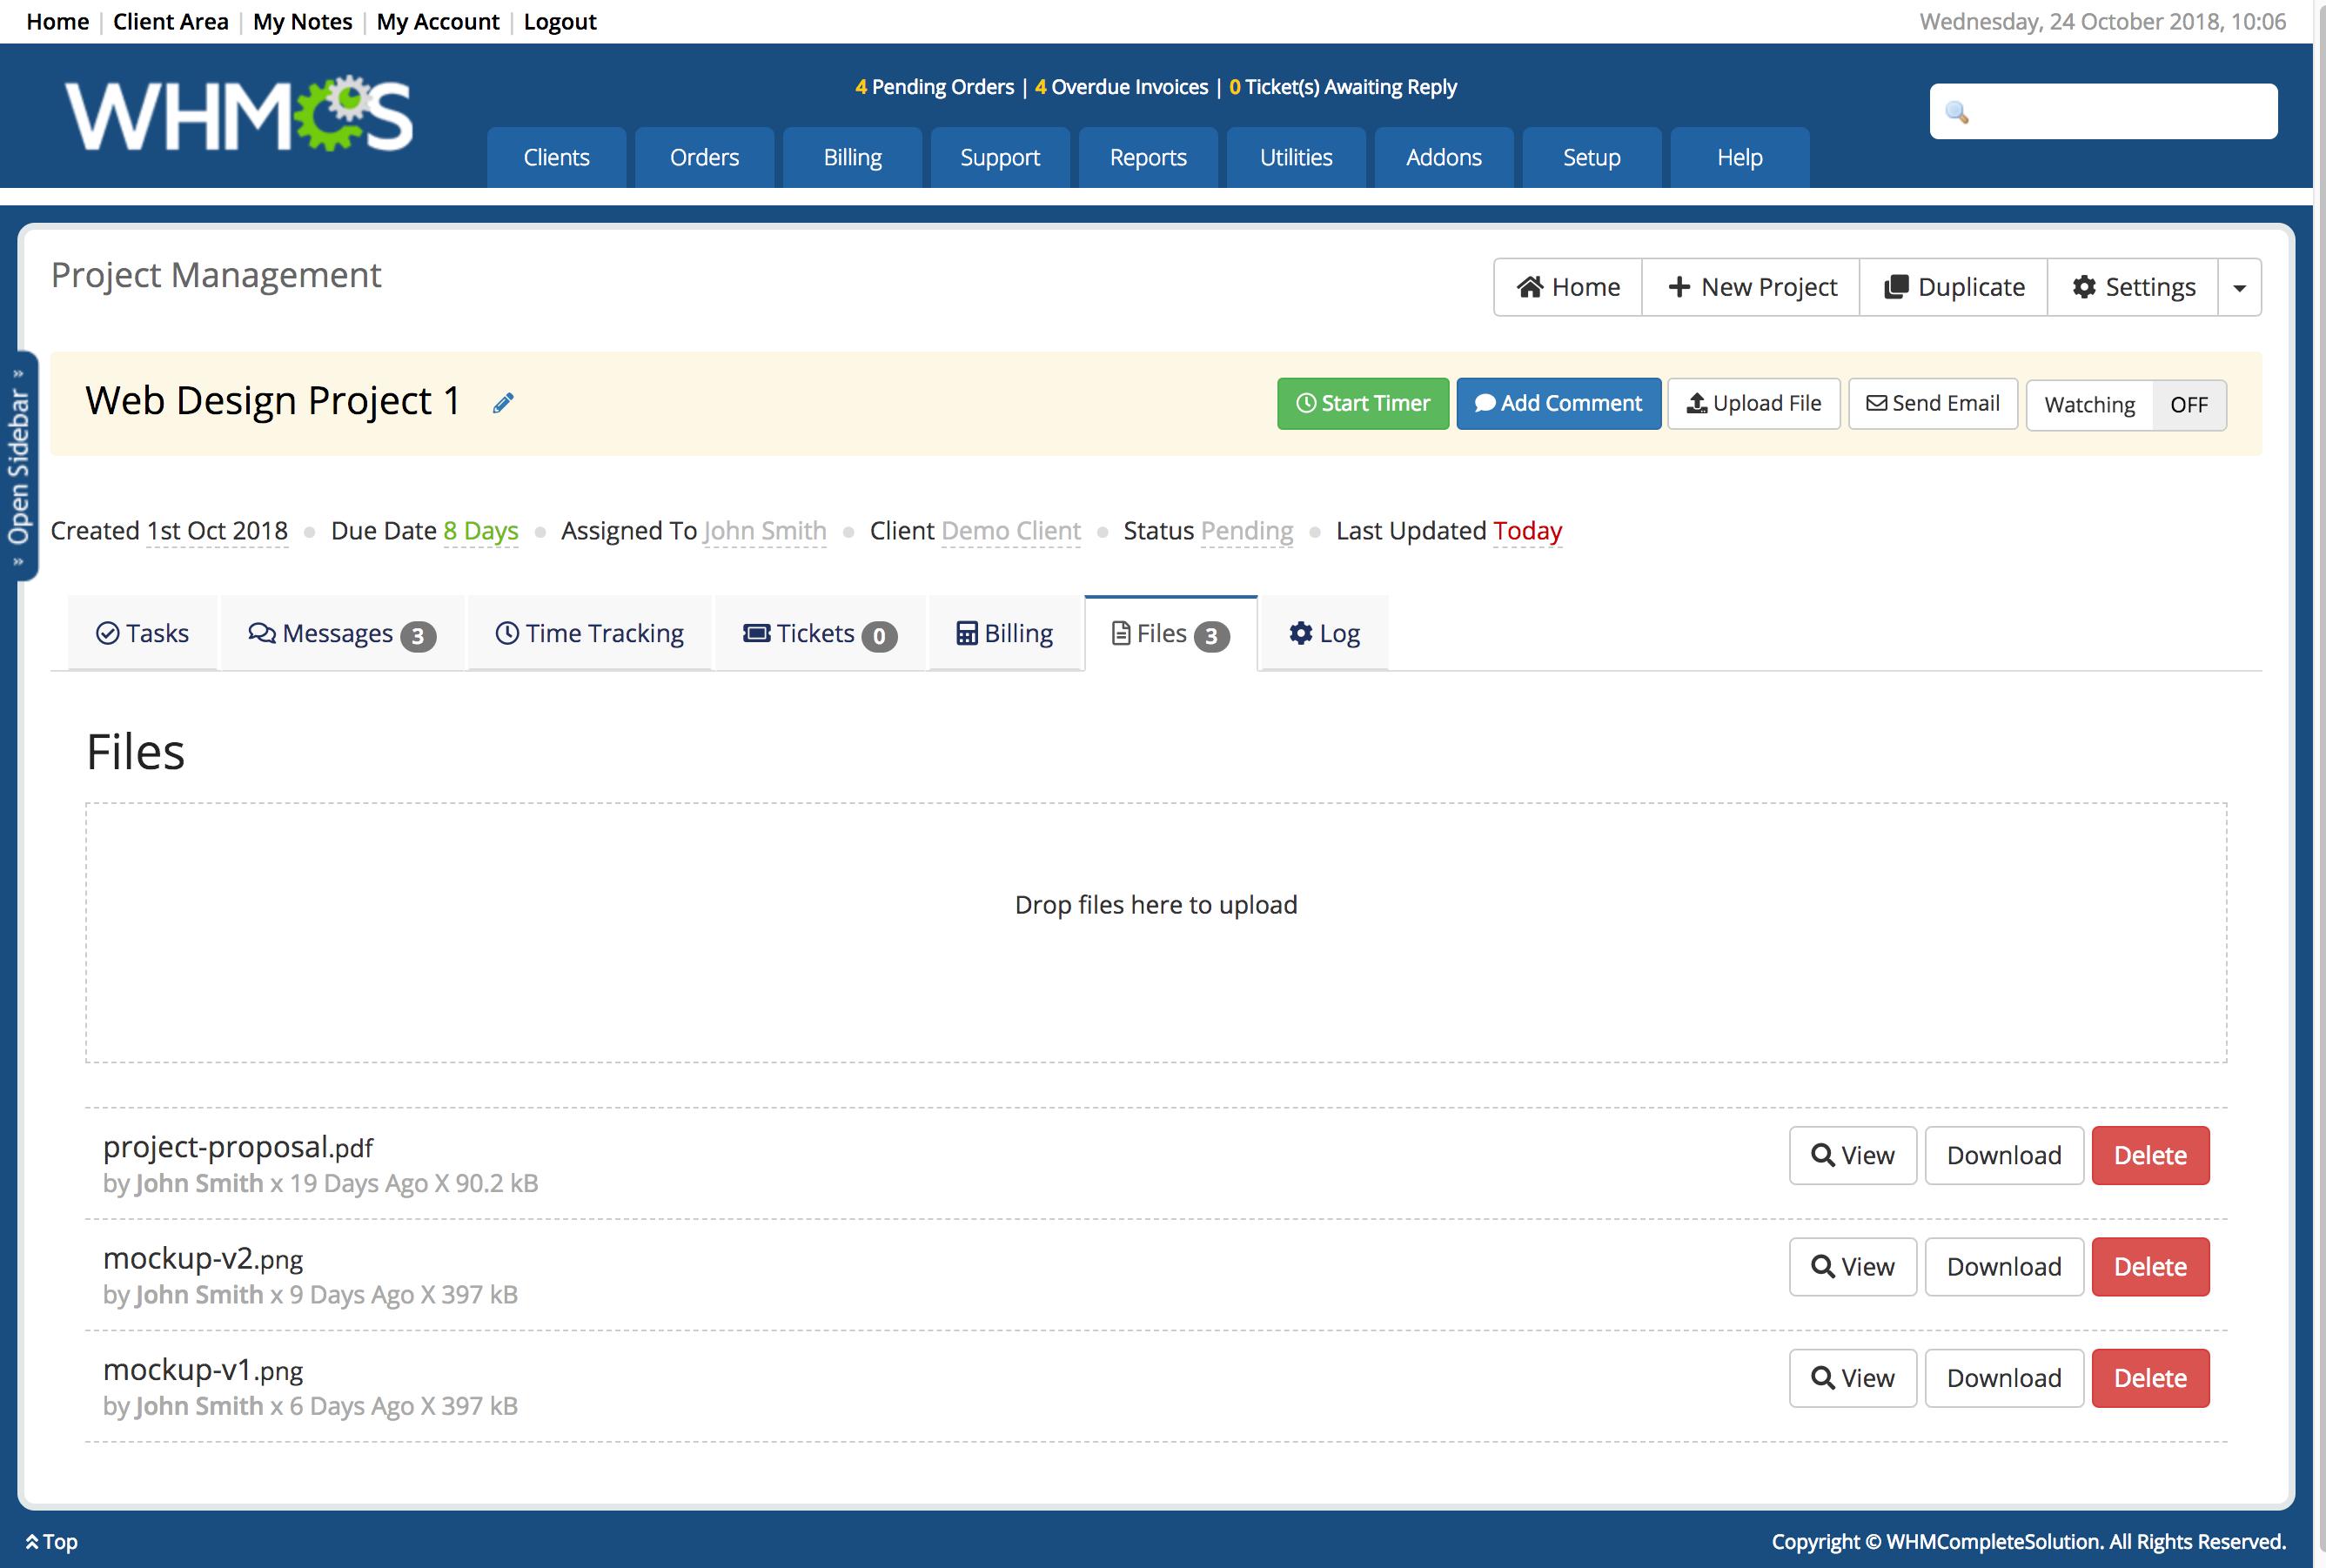 Project Management Addon - WHMCS Marketplace